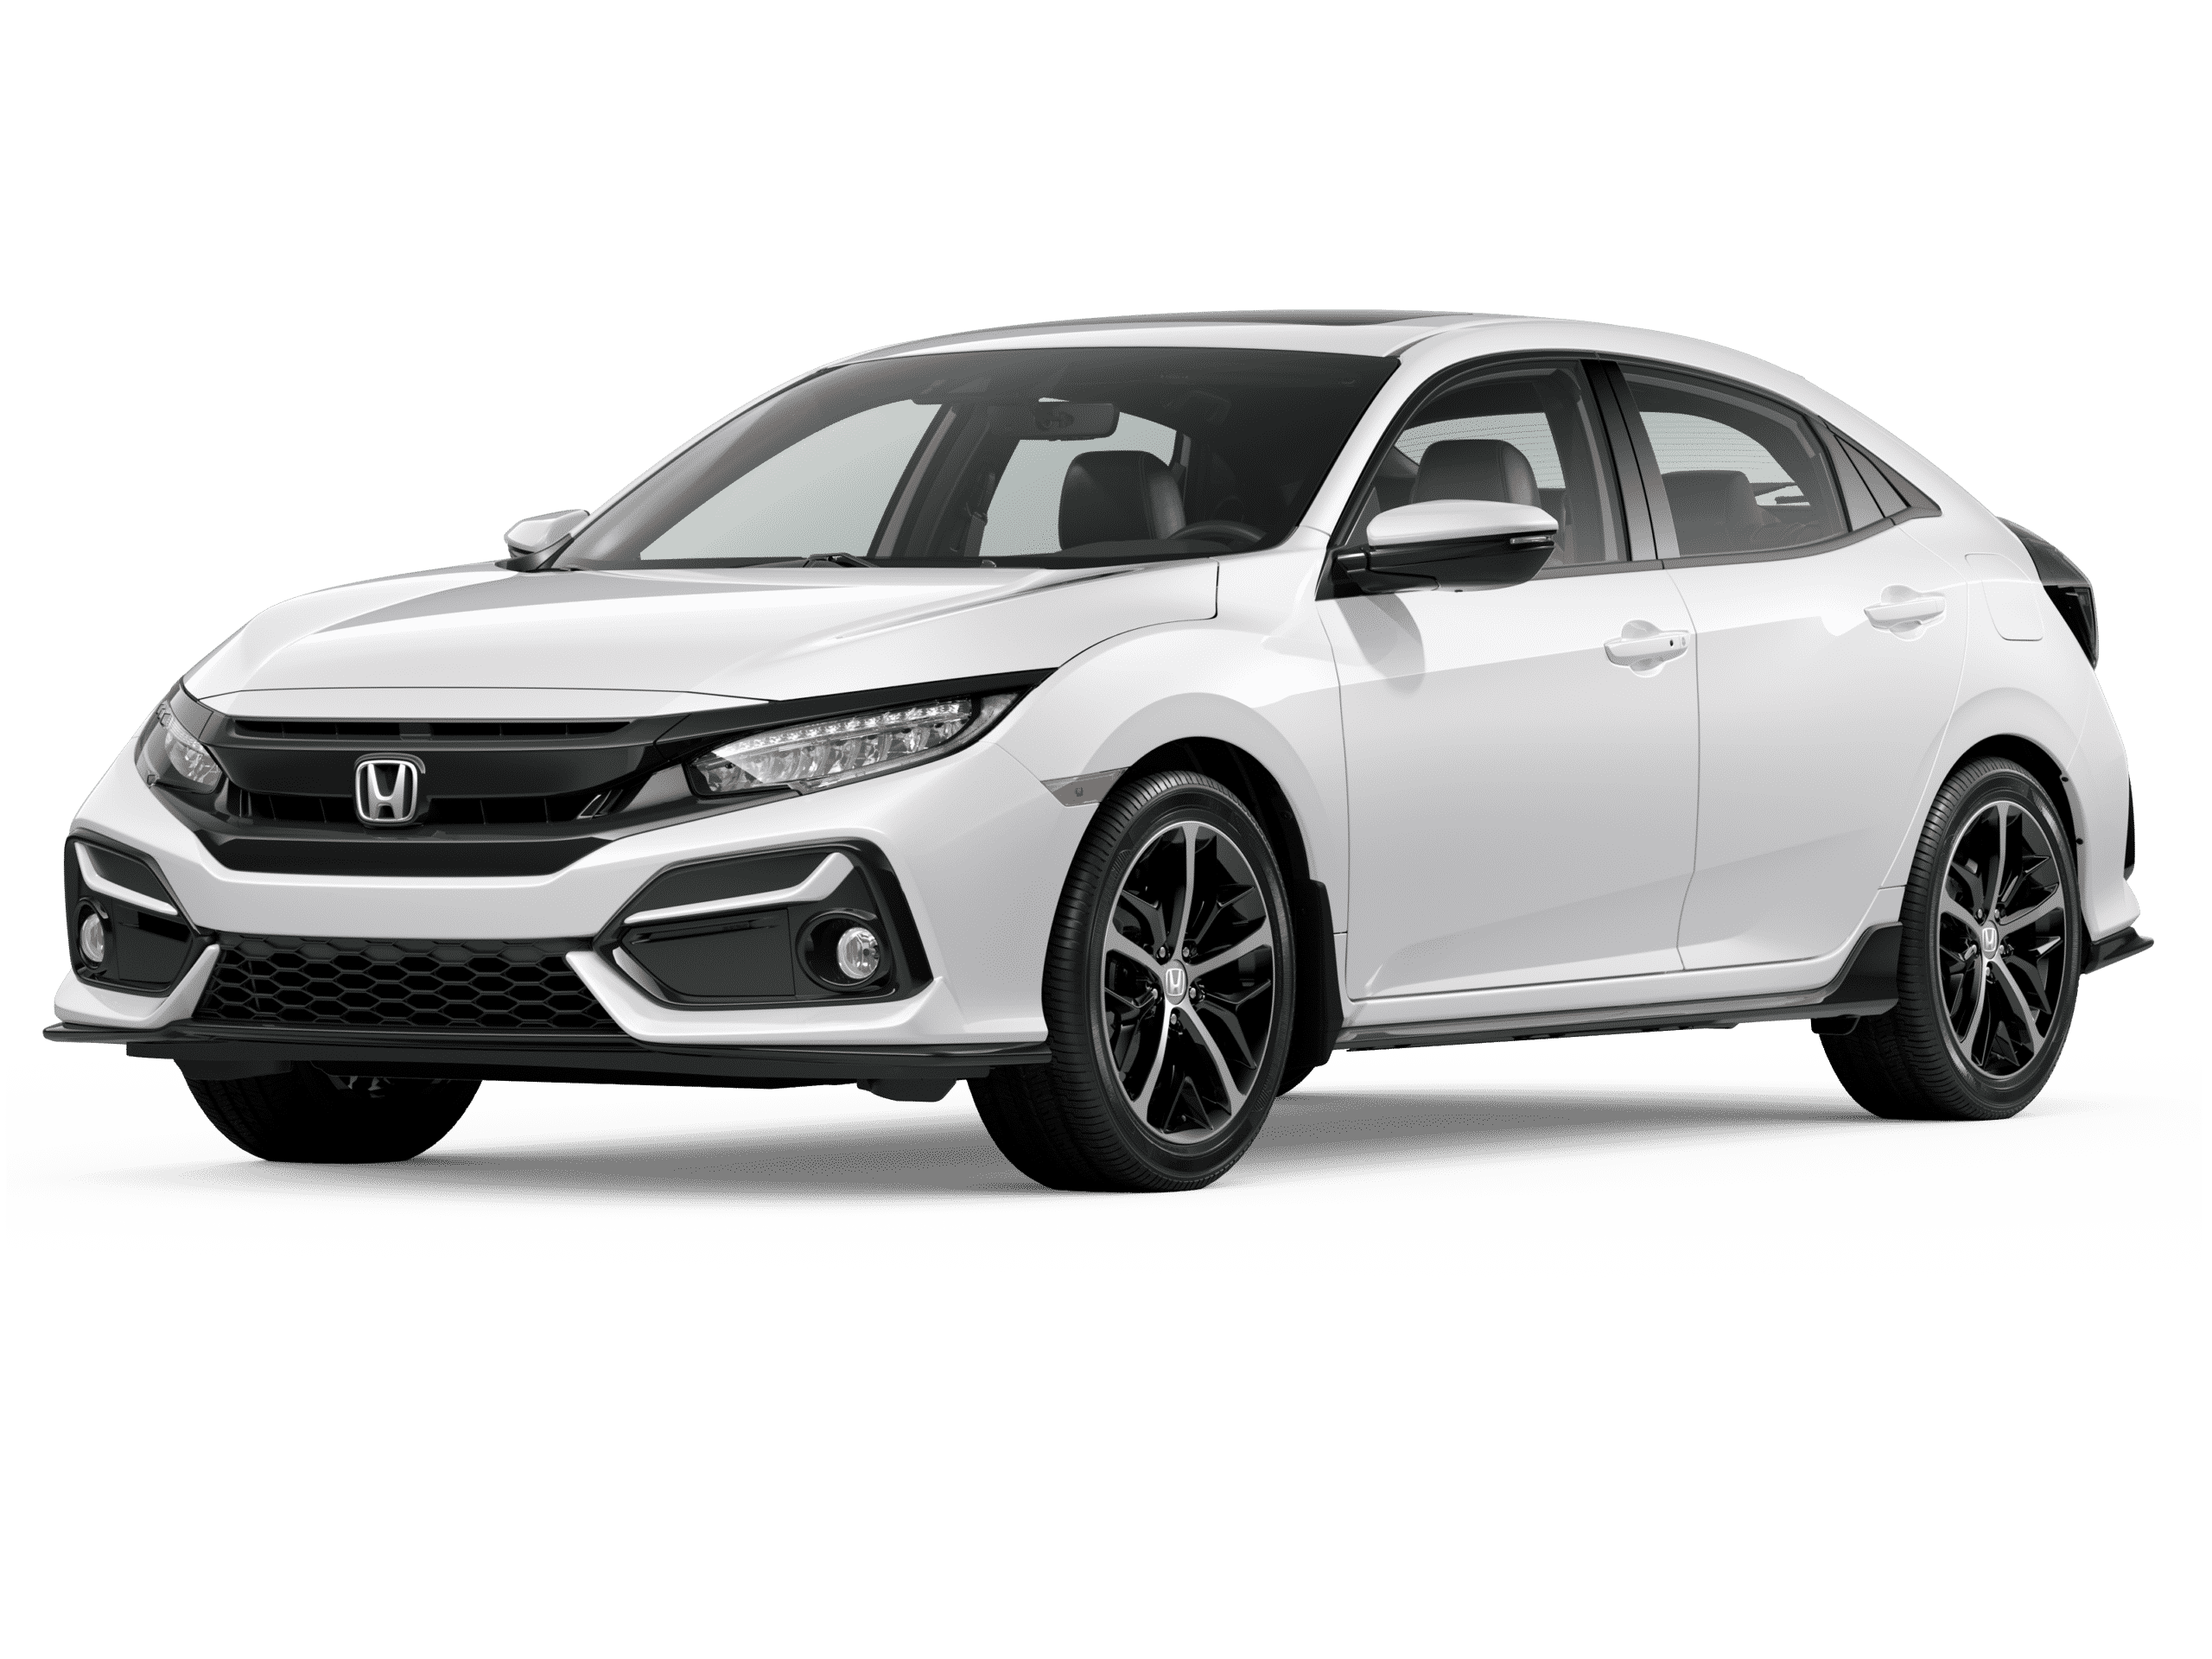 2020 Honda Civic Review Pricing Specs Conquest Cars Canada